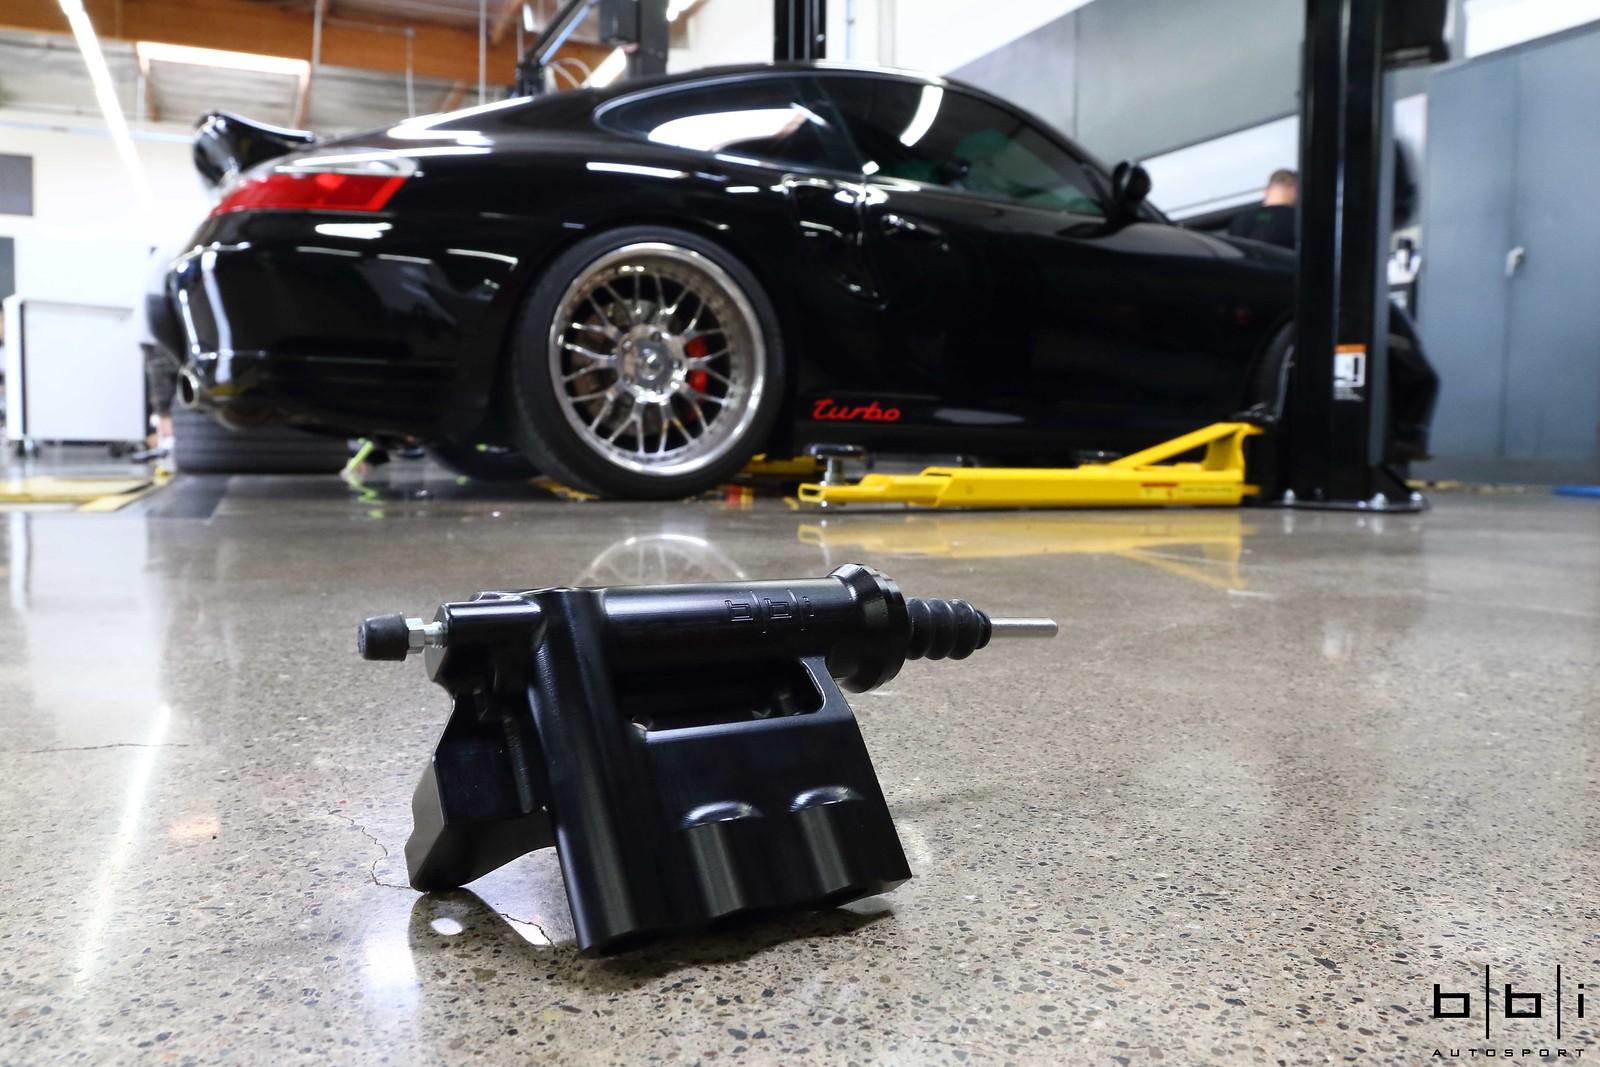 Porsche 996 Turbo Gets Bbi Autosport Clutch Slave Cylinder Ford Diagram Master Conversion Upgrade Kit